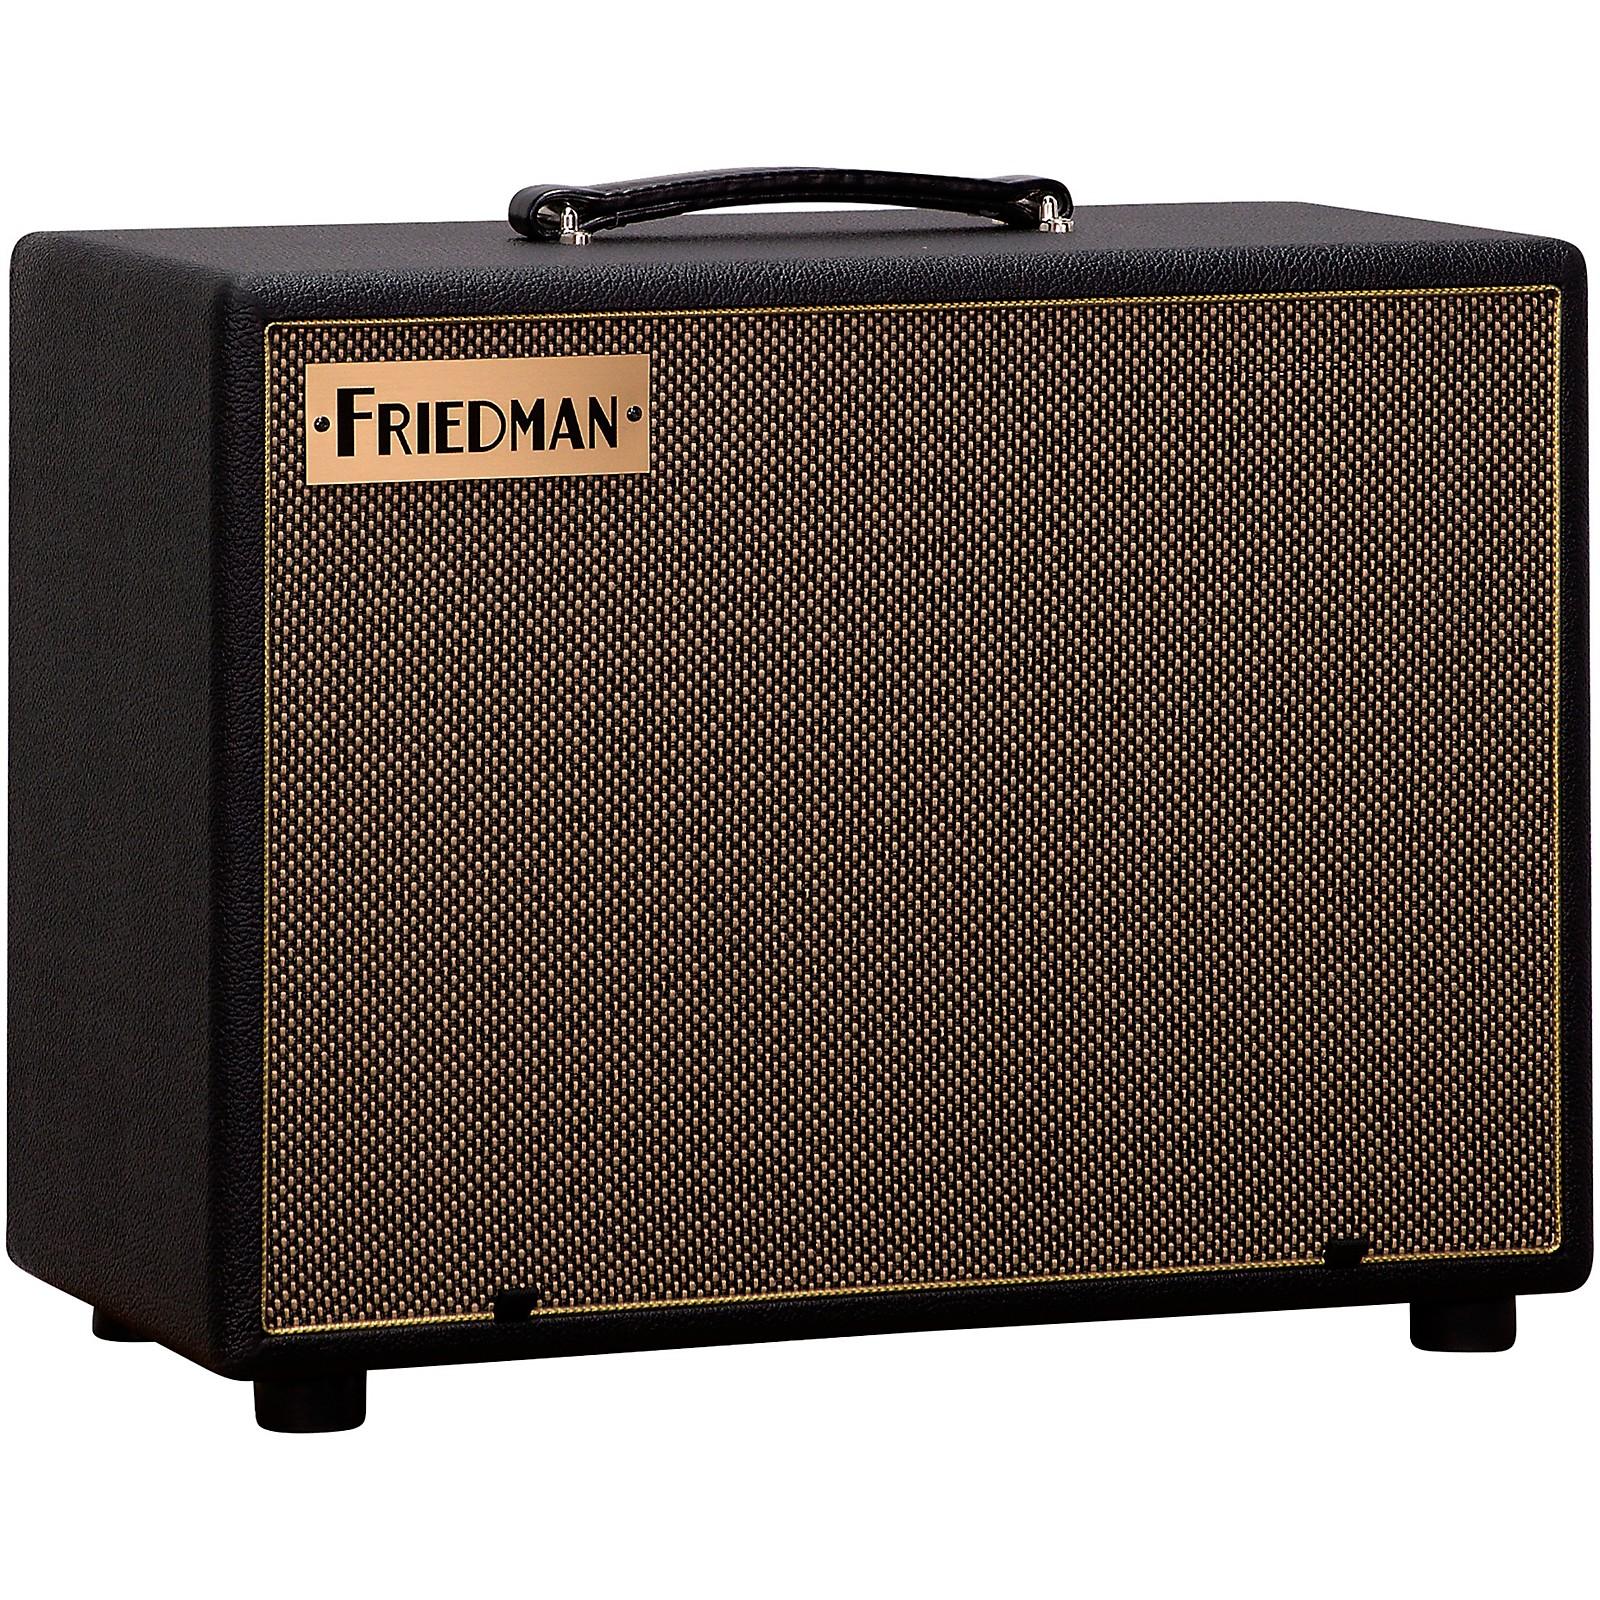 Friedman ASC-10 500W 1x10 Bi-Amp Powered Guitar Cabinet